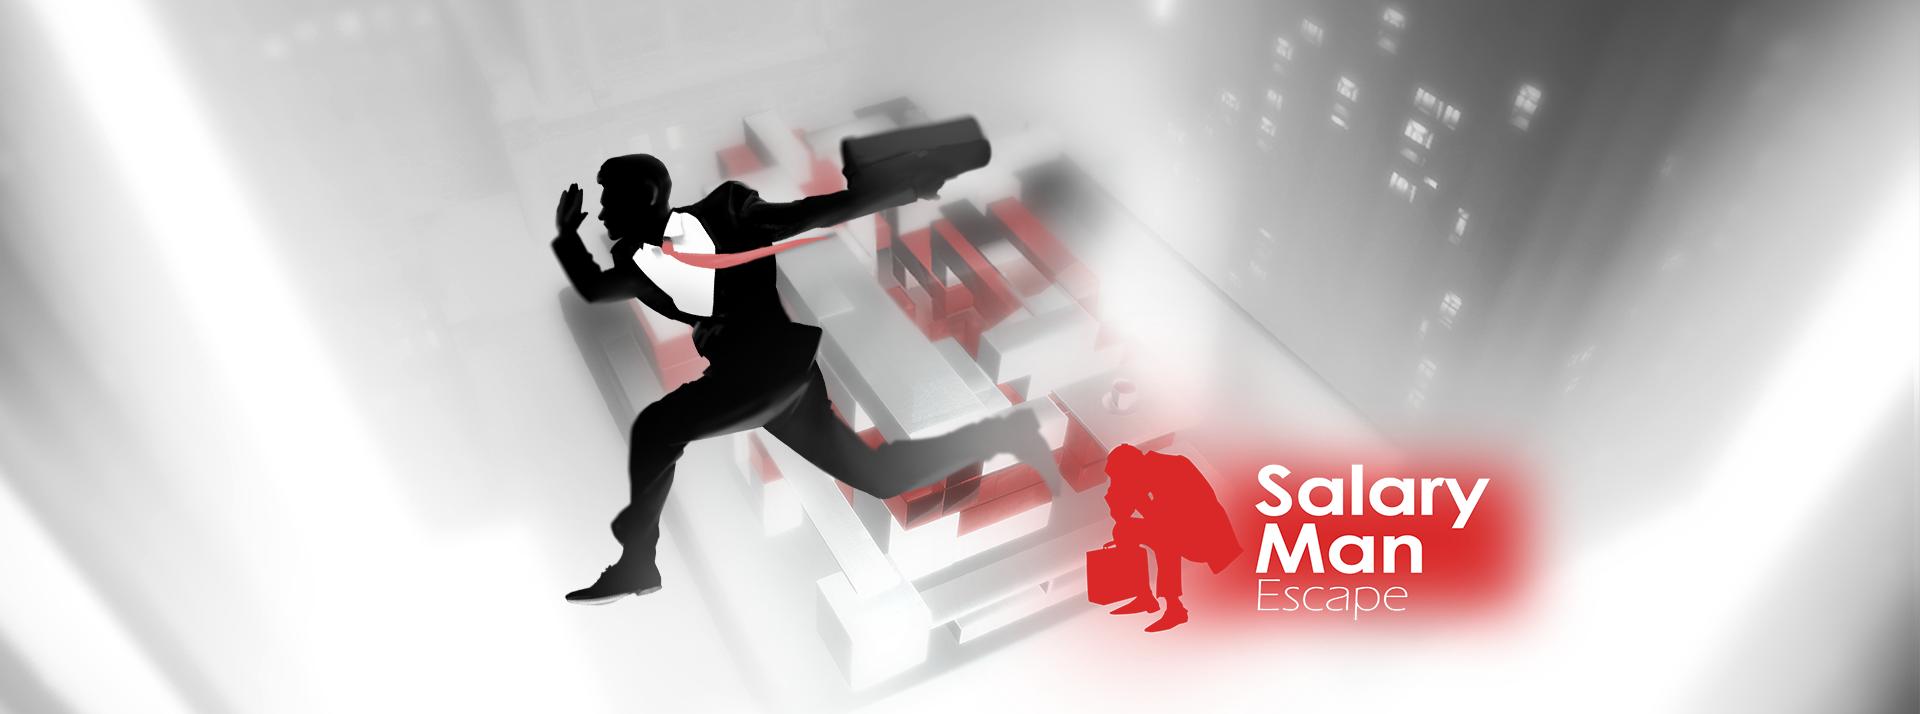 4_Salary-Man-Escape1.png